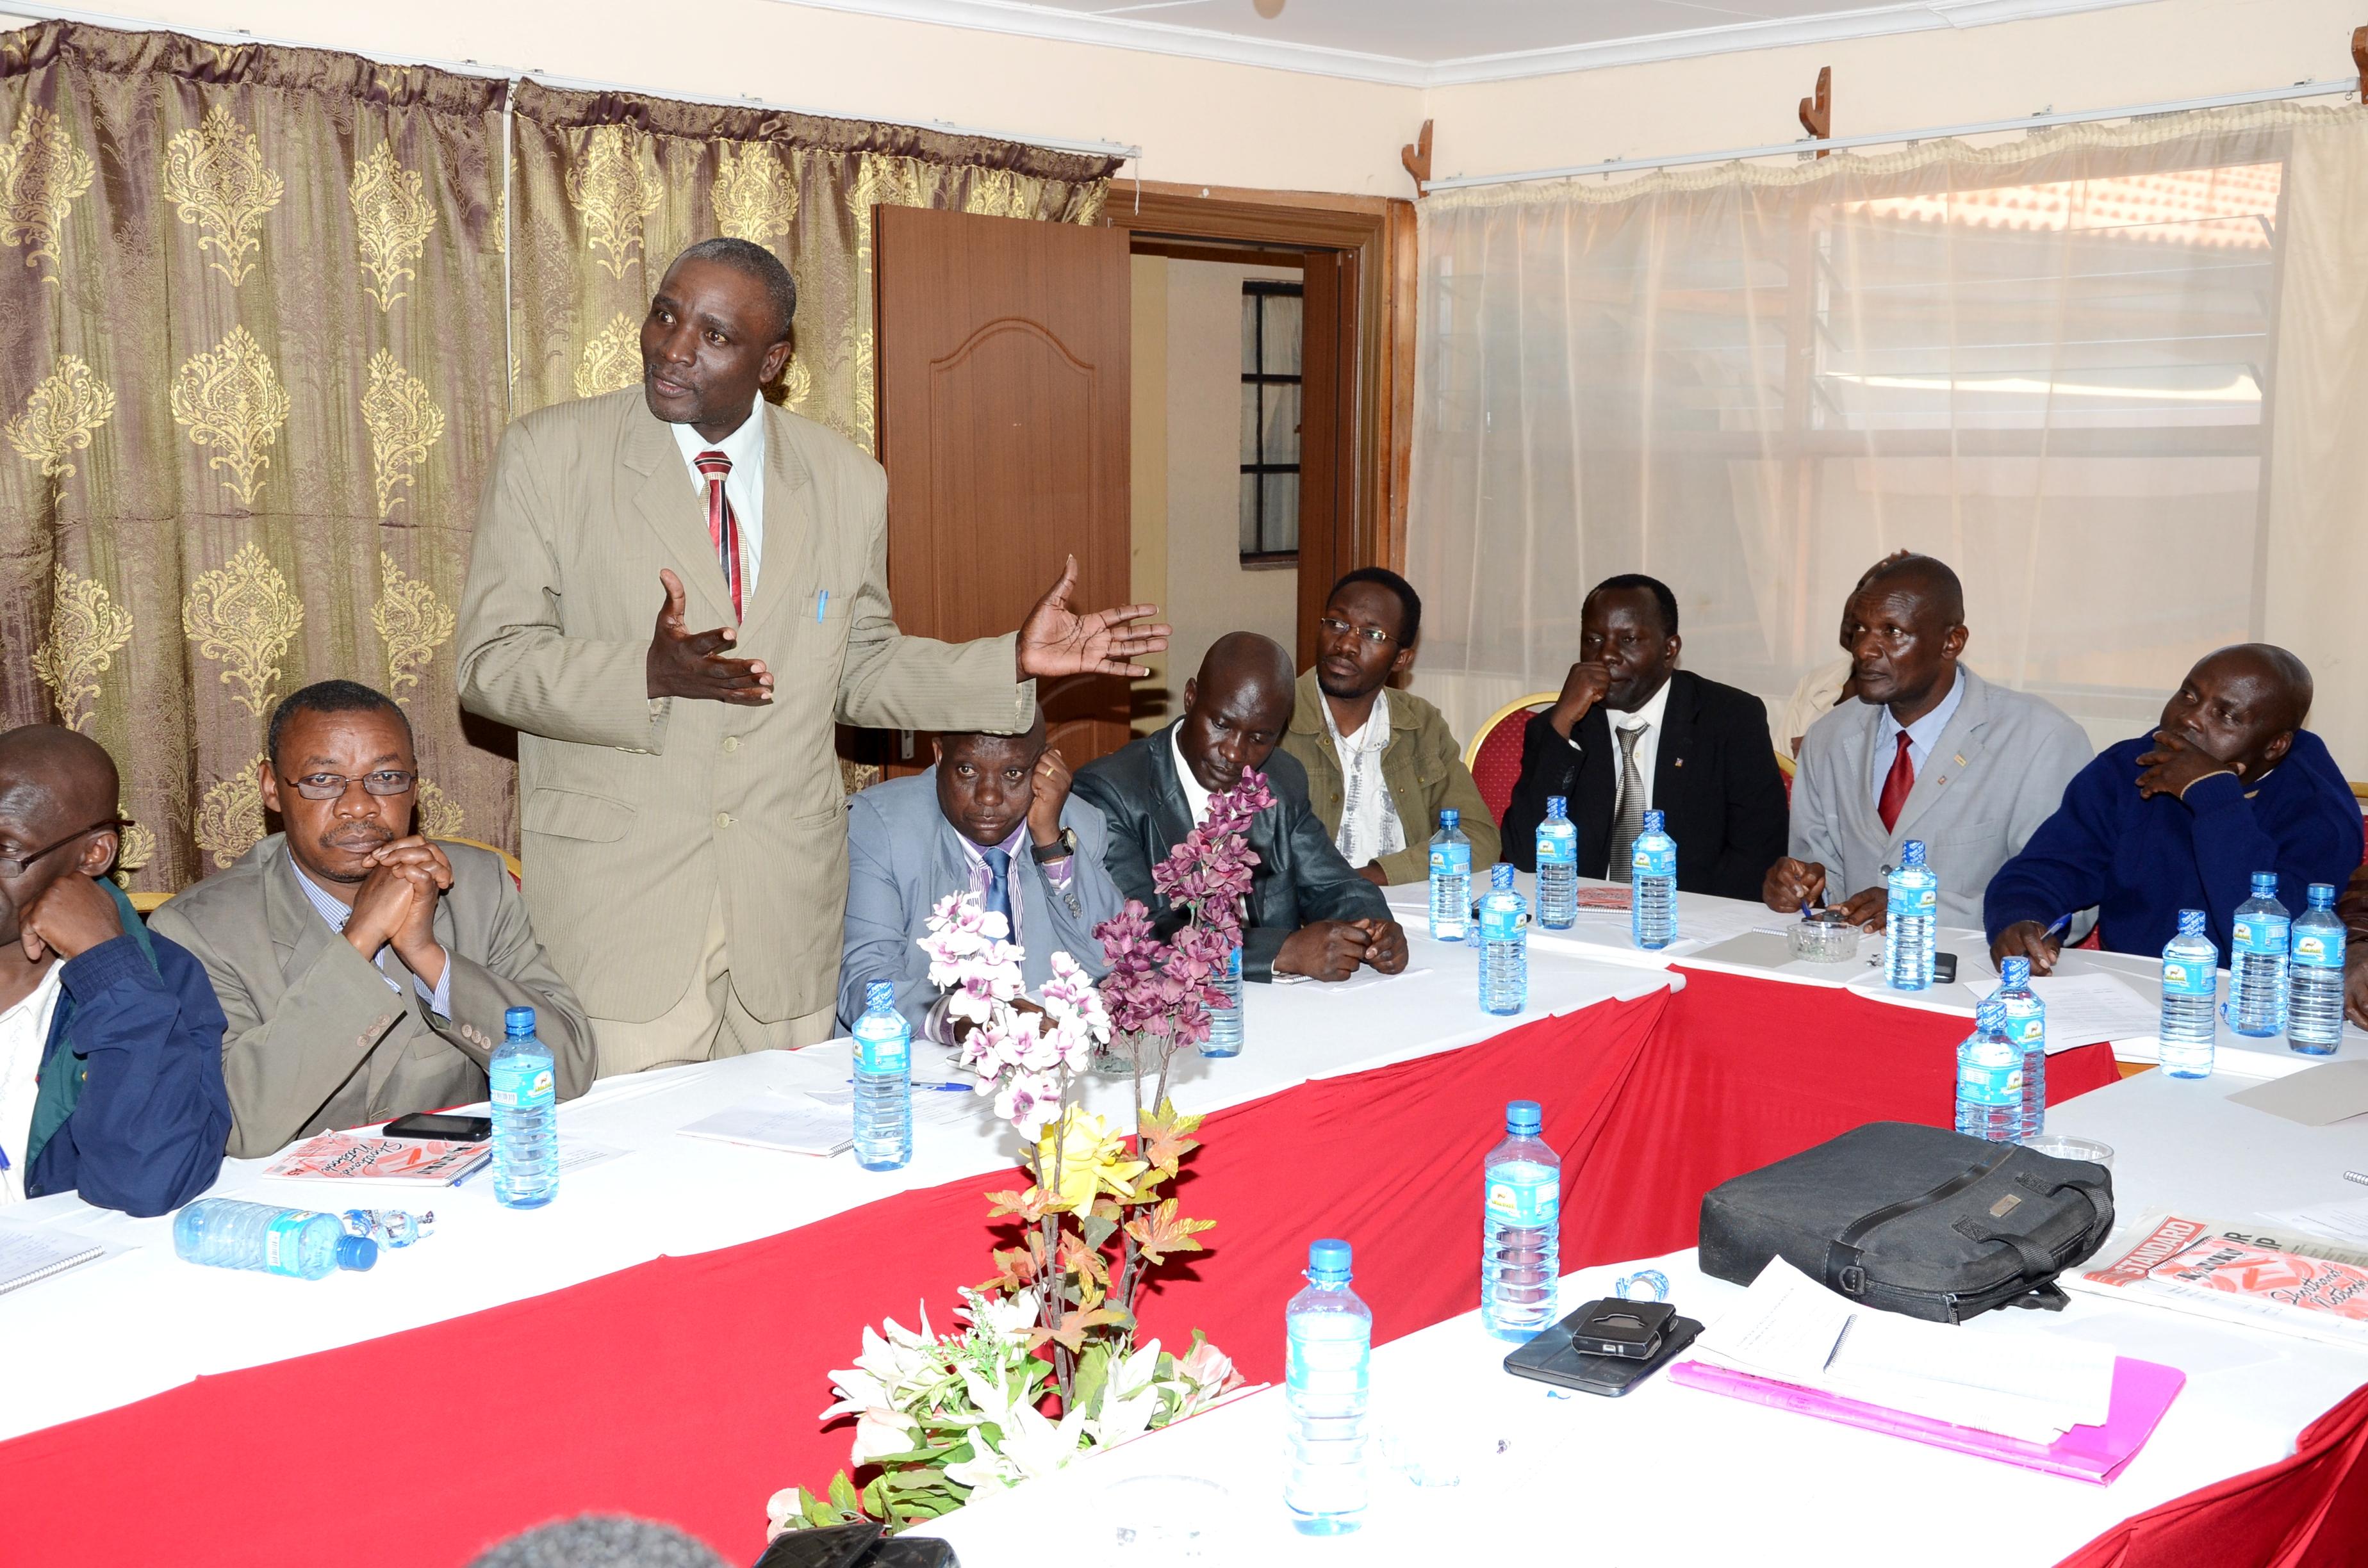 trade unions in kenya Central organization of trade unions - cotu - kenya, nairobi, kenya 24,150 likes 48 talking about this the central organization of trade unions.